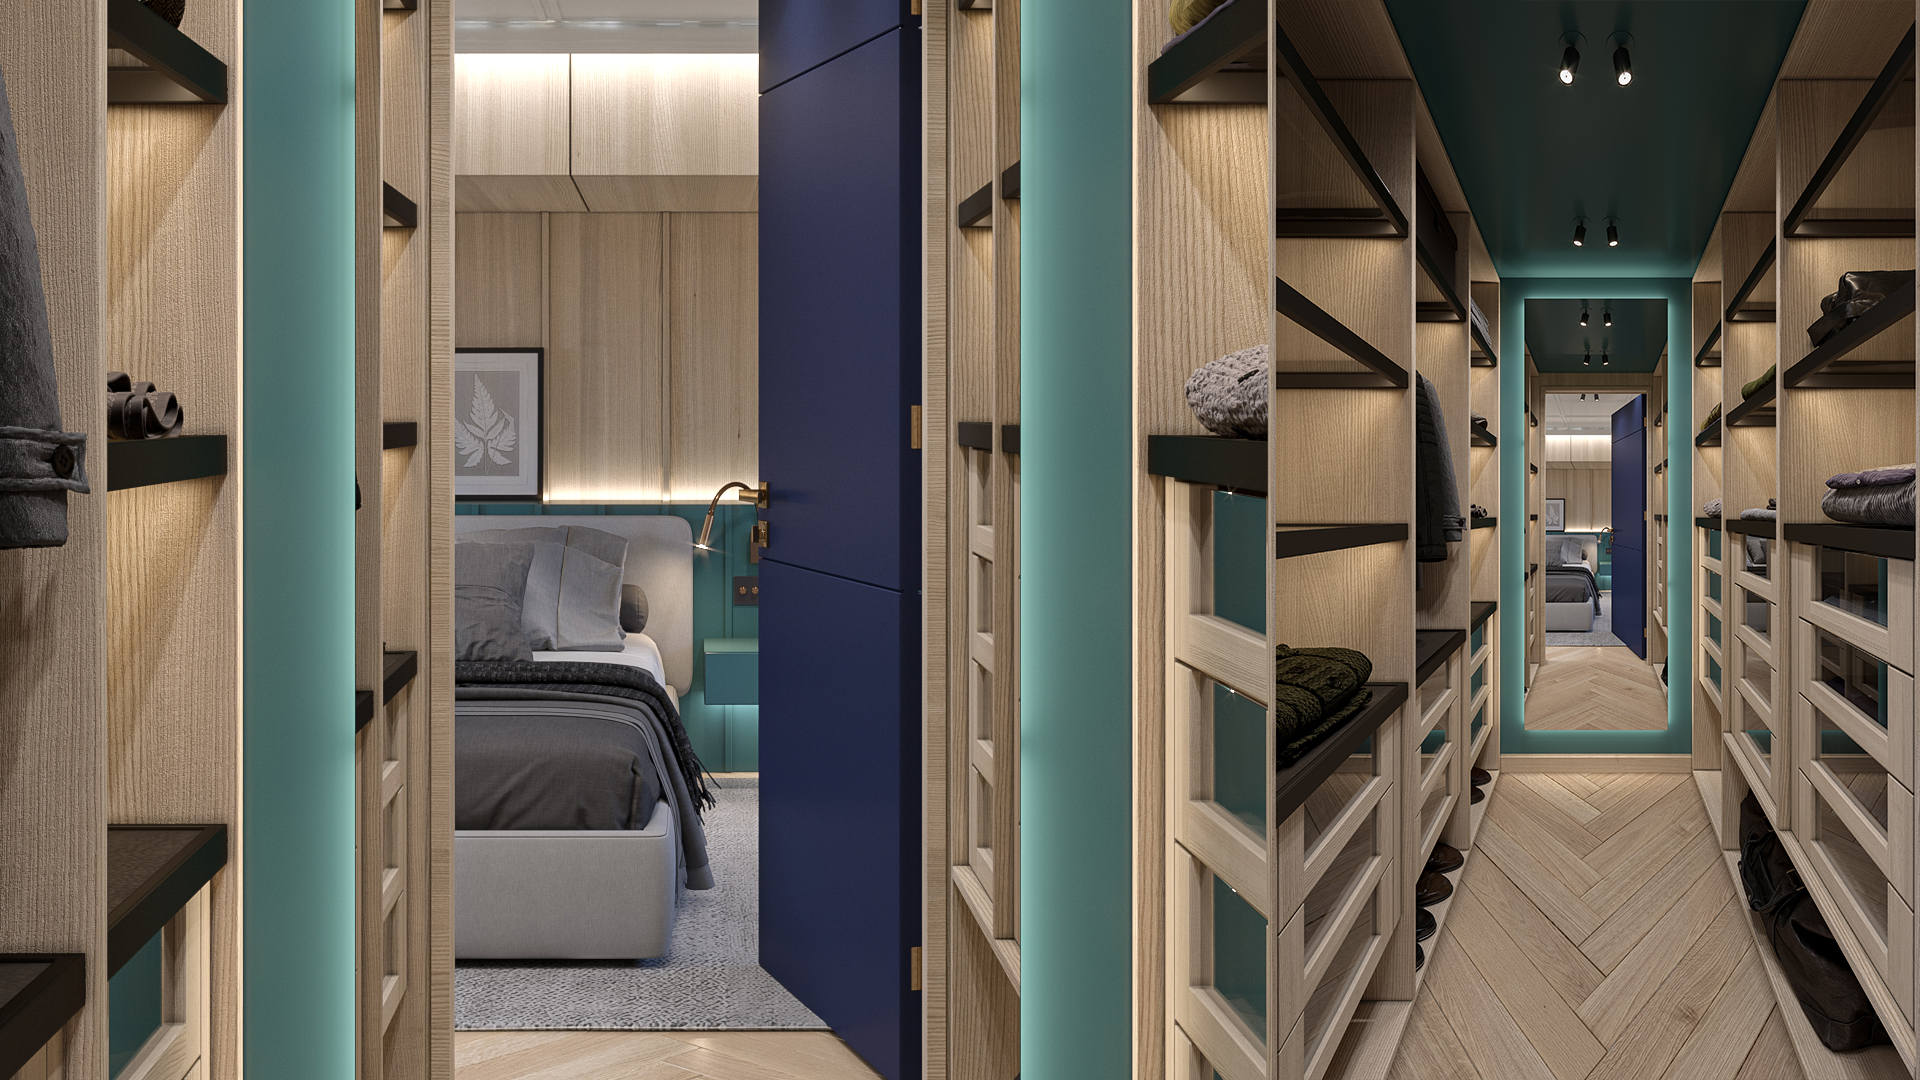 Maayan-Golan_Architectural-Visualization_interior-visualization_yacht-design_walk-in-closet_design-by-rust_03